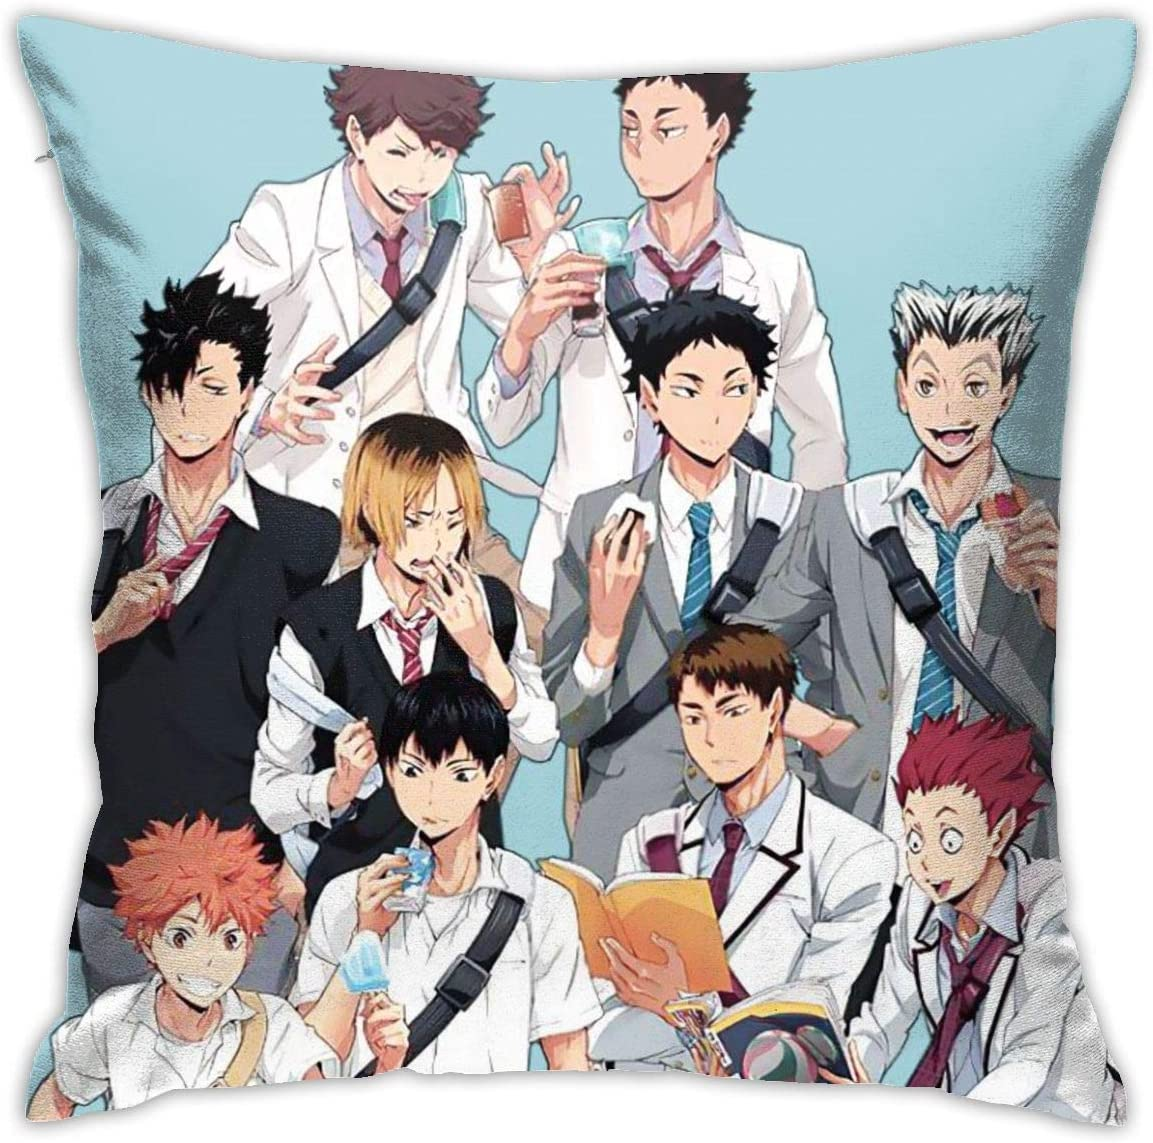 "Pillowcase 18"""" X18 Haikyuu!!! Cool Comic Newdecorative Square Throw Pillow Covers Cushion Hold for Sofa Bedroom Car Home Decor"